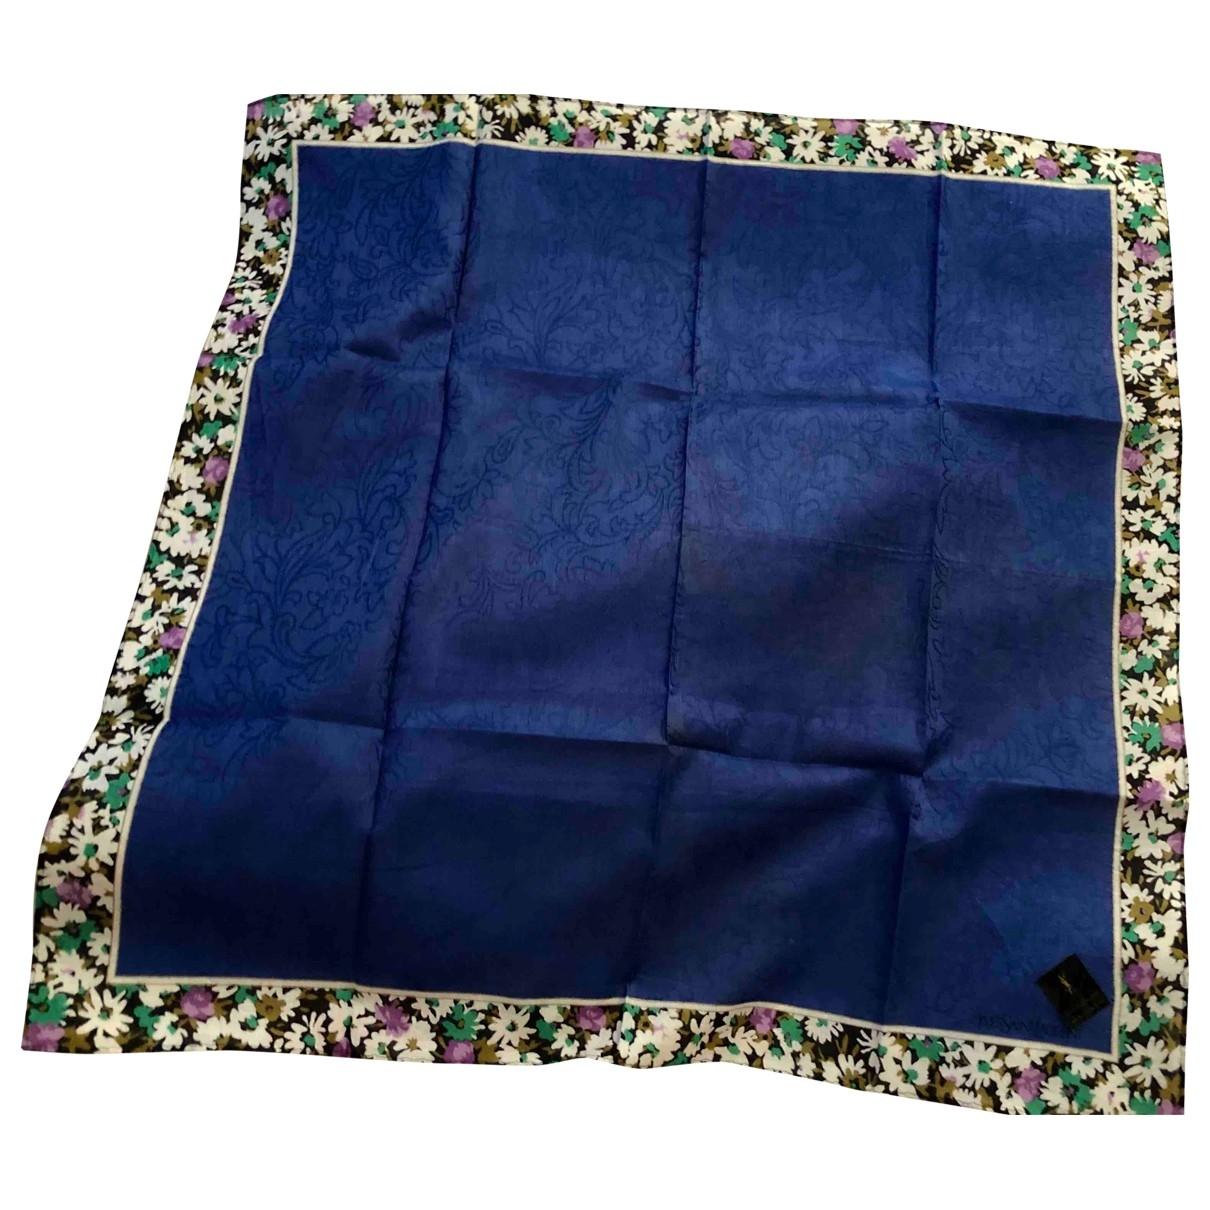 Yves Saint Laurent \N Blue Cotton scarf for Women \N